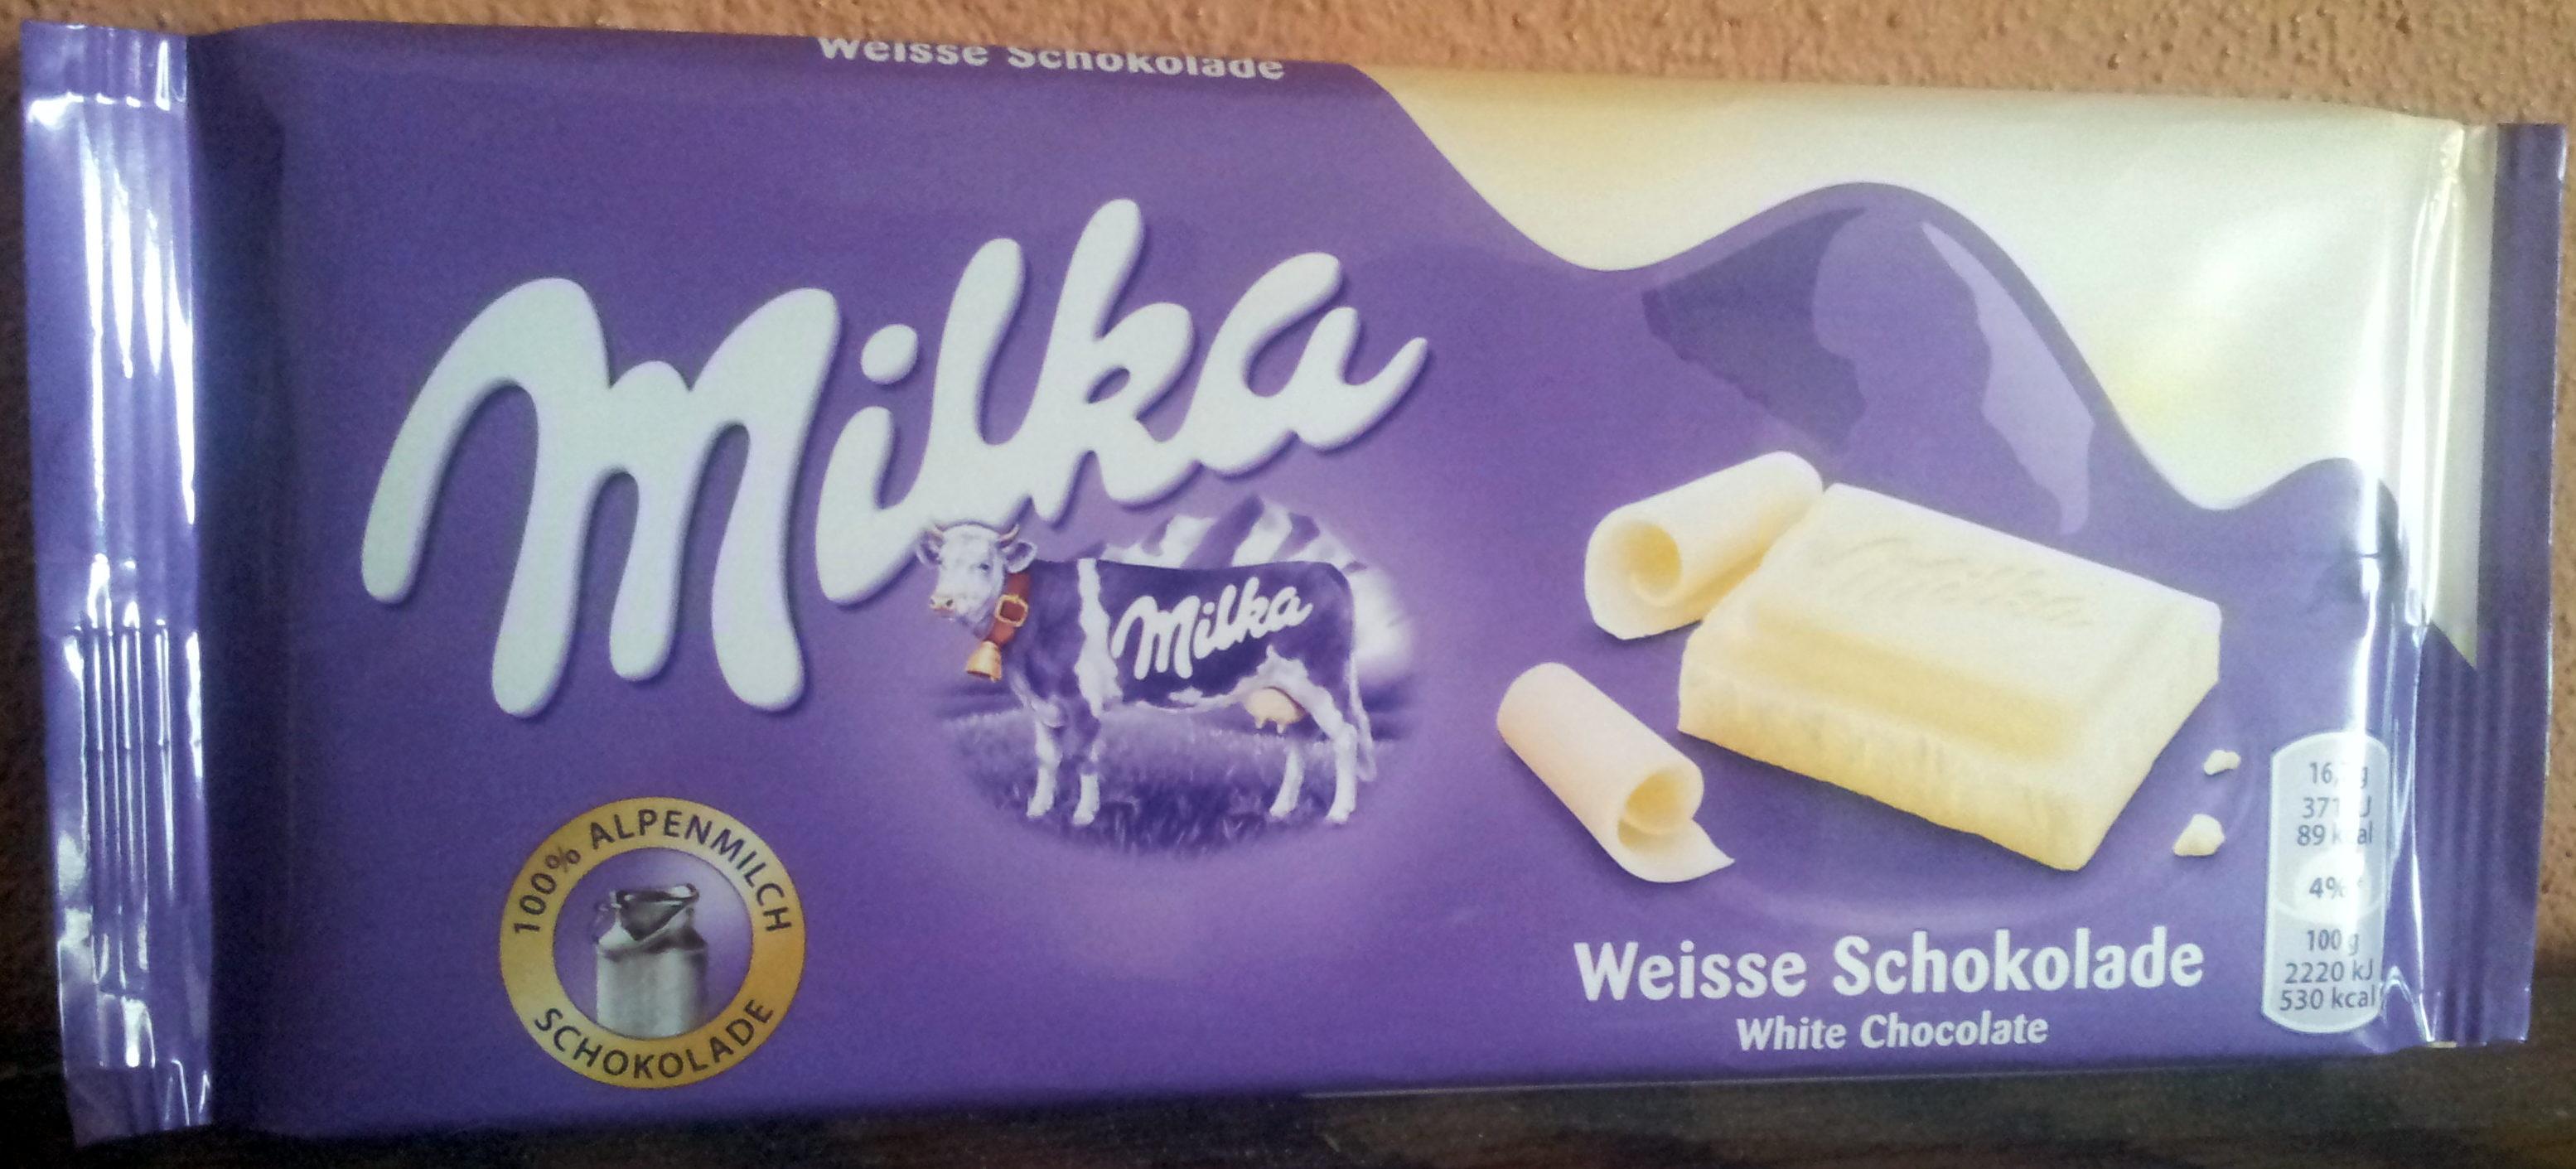 White Chocolate Bar - Product